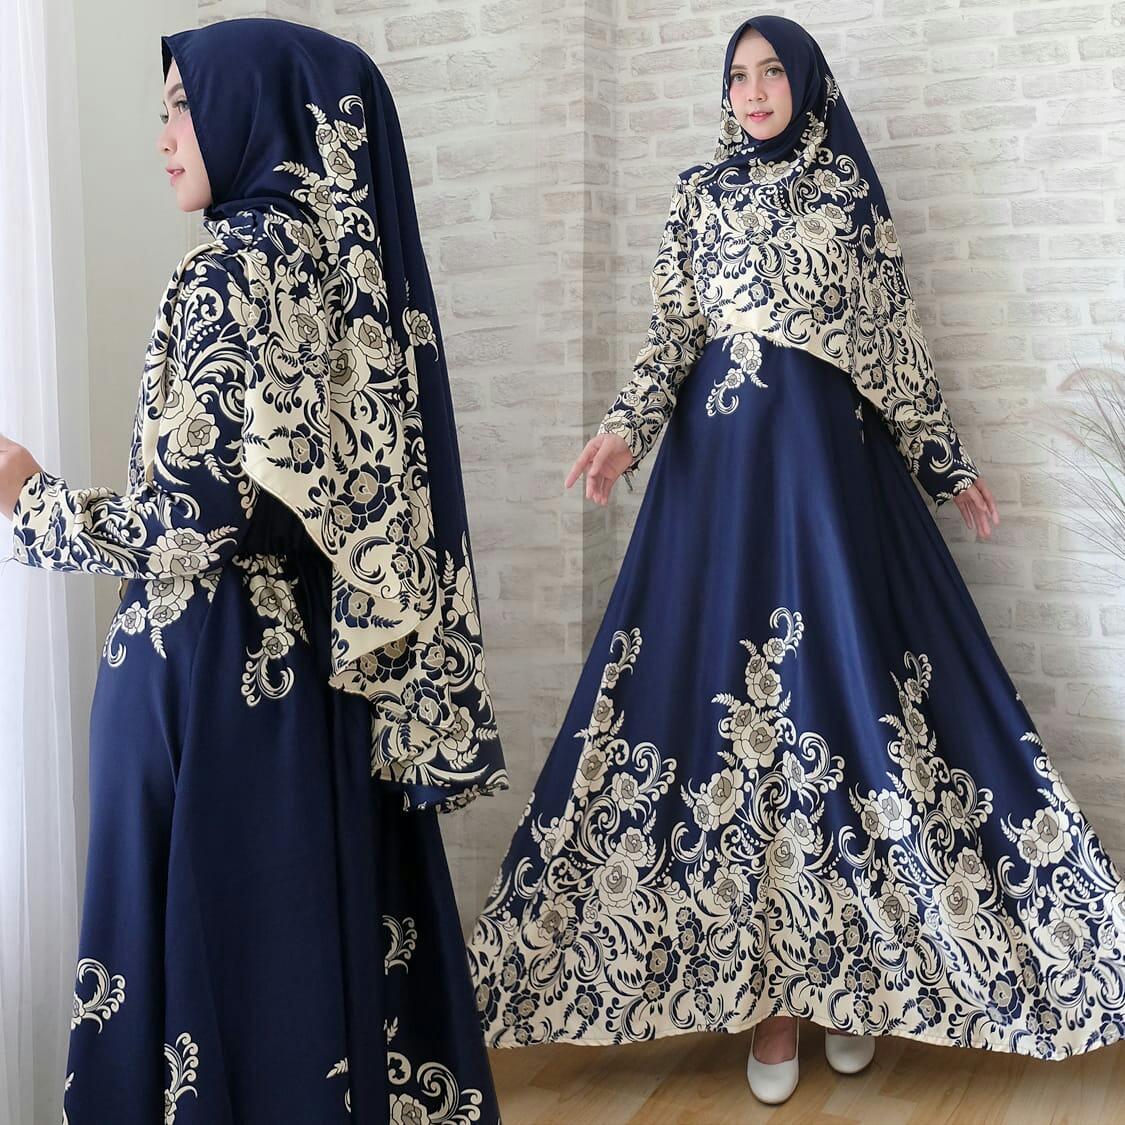 Gamis Modern Brand Syari Baju Muslim Gina Shofiya Umbrella Navy Real Pict